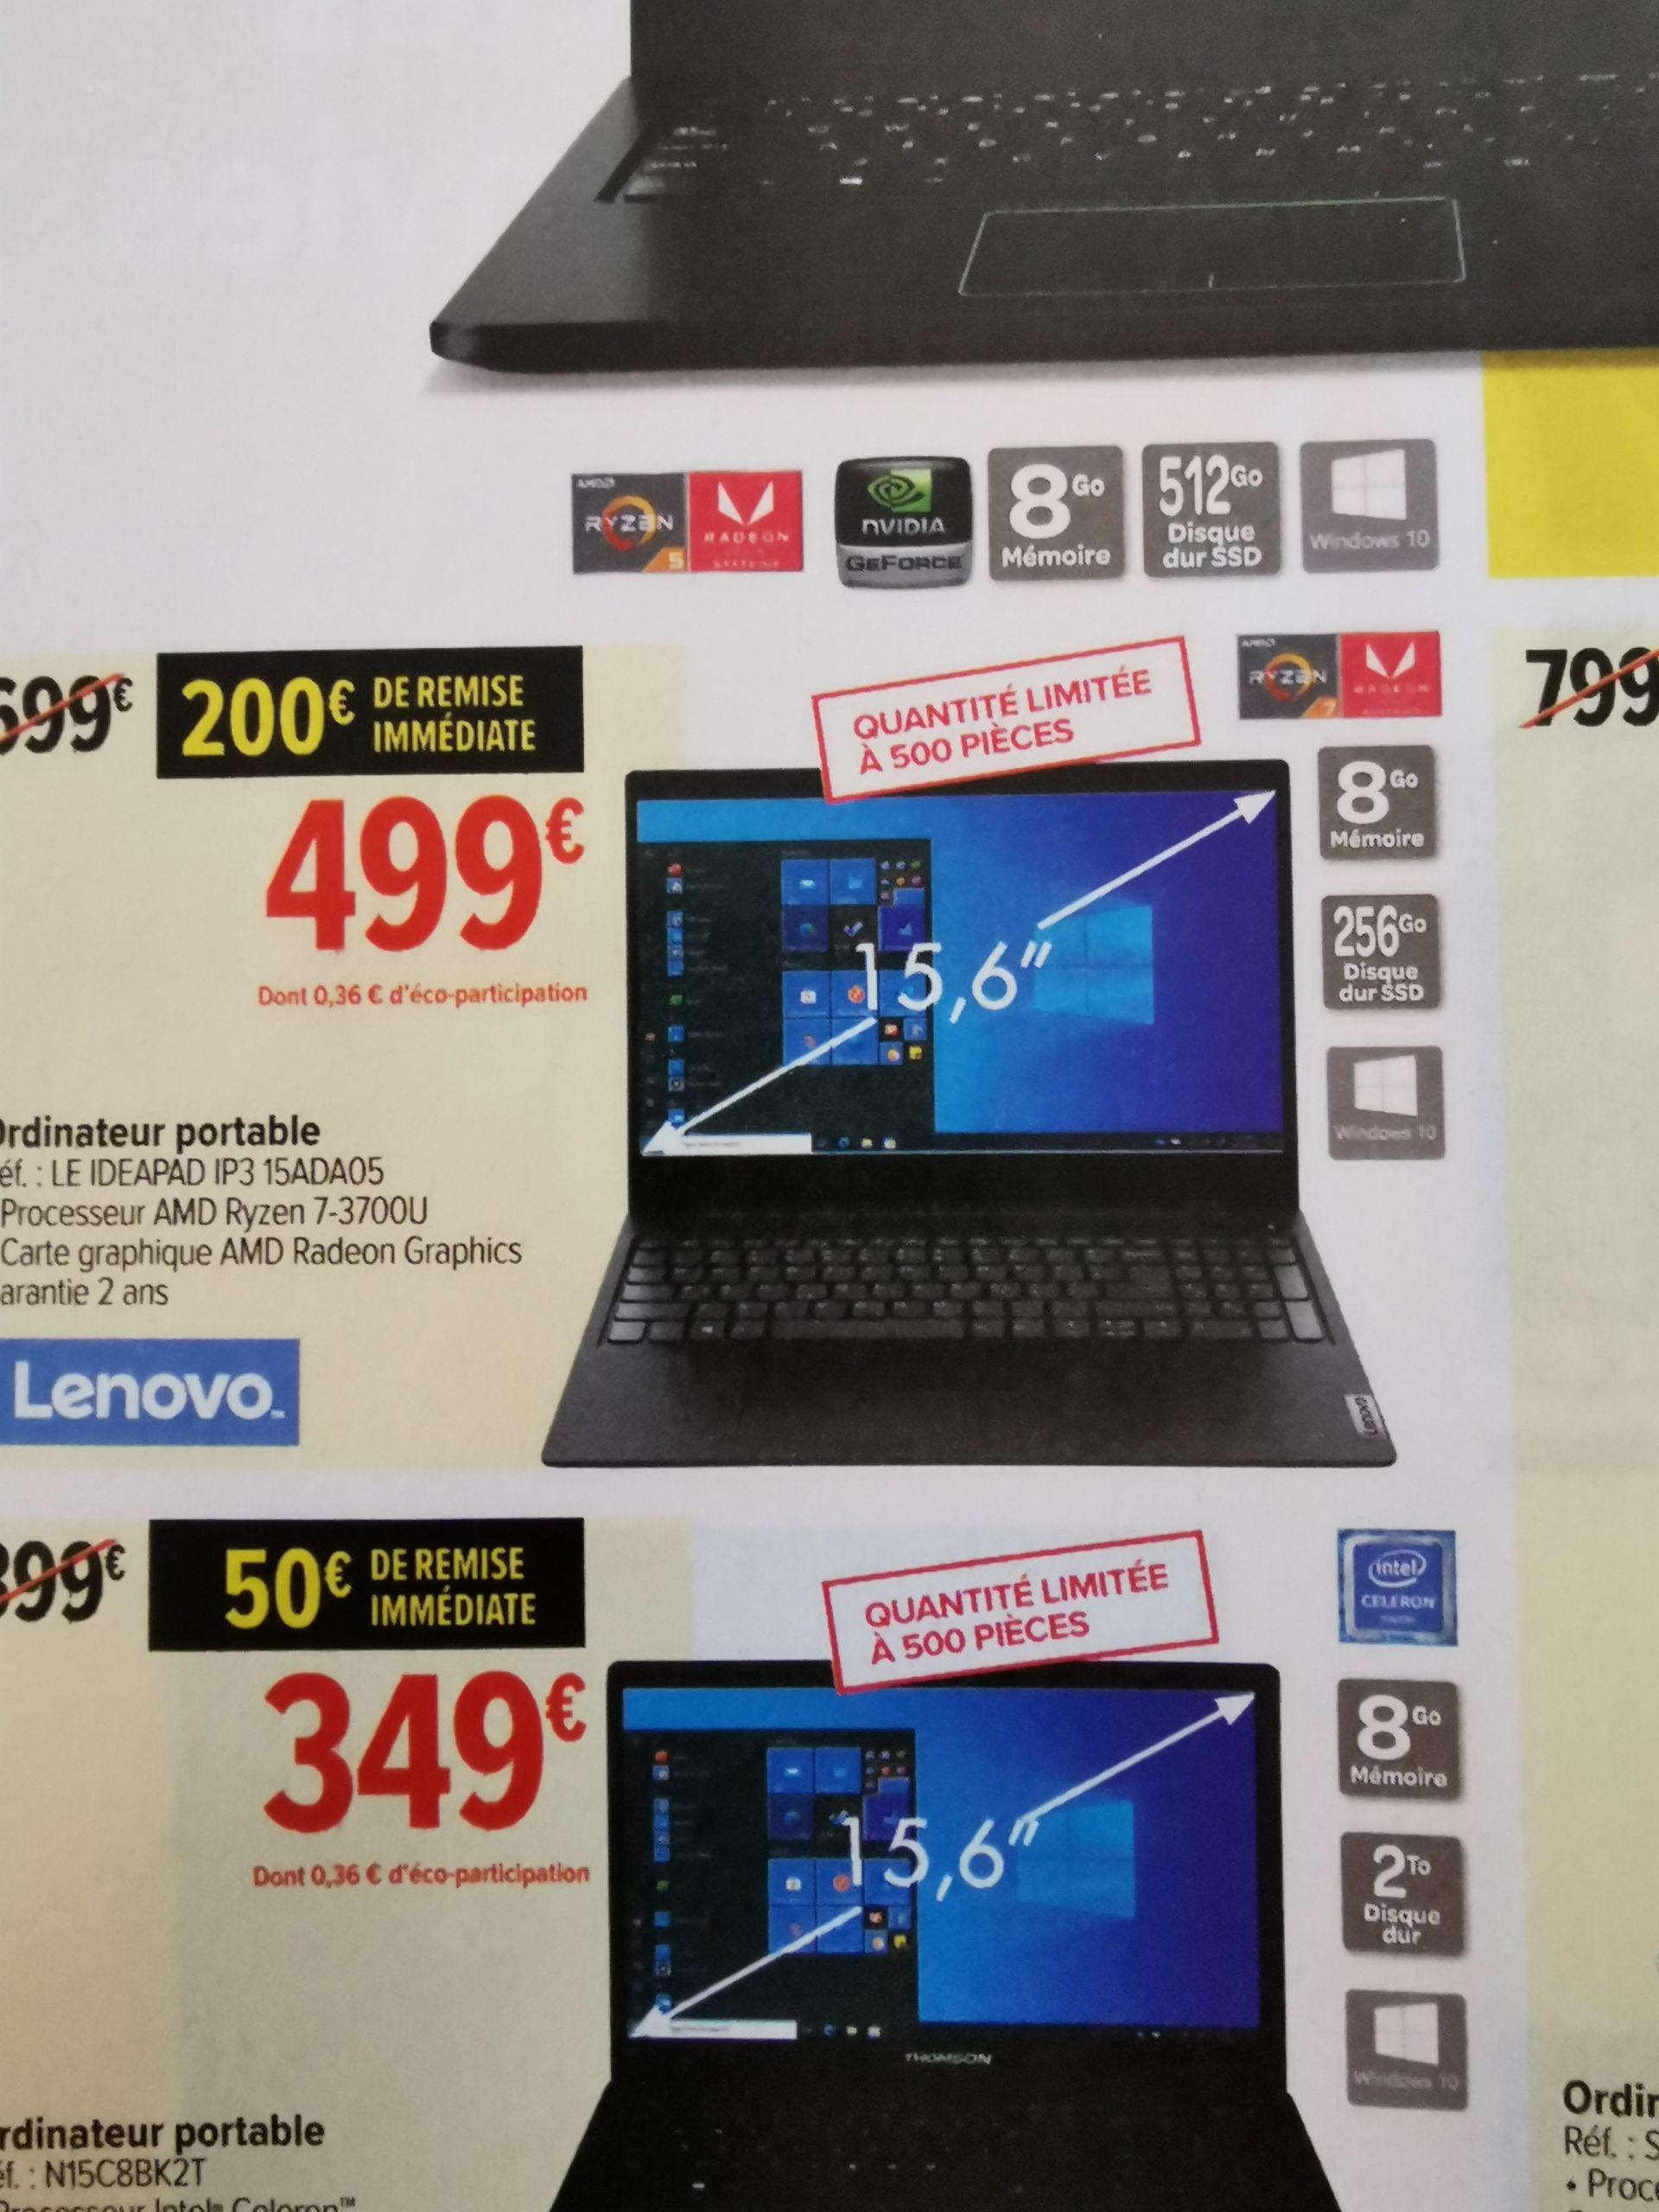 "PC Portable 15.6"" Lenovo IdeaPad 3 15ADA05 - AMD Ryzen 3700 U, 8 Go de RAM, SSD 256 Go"